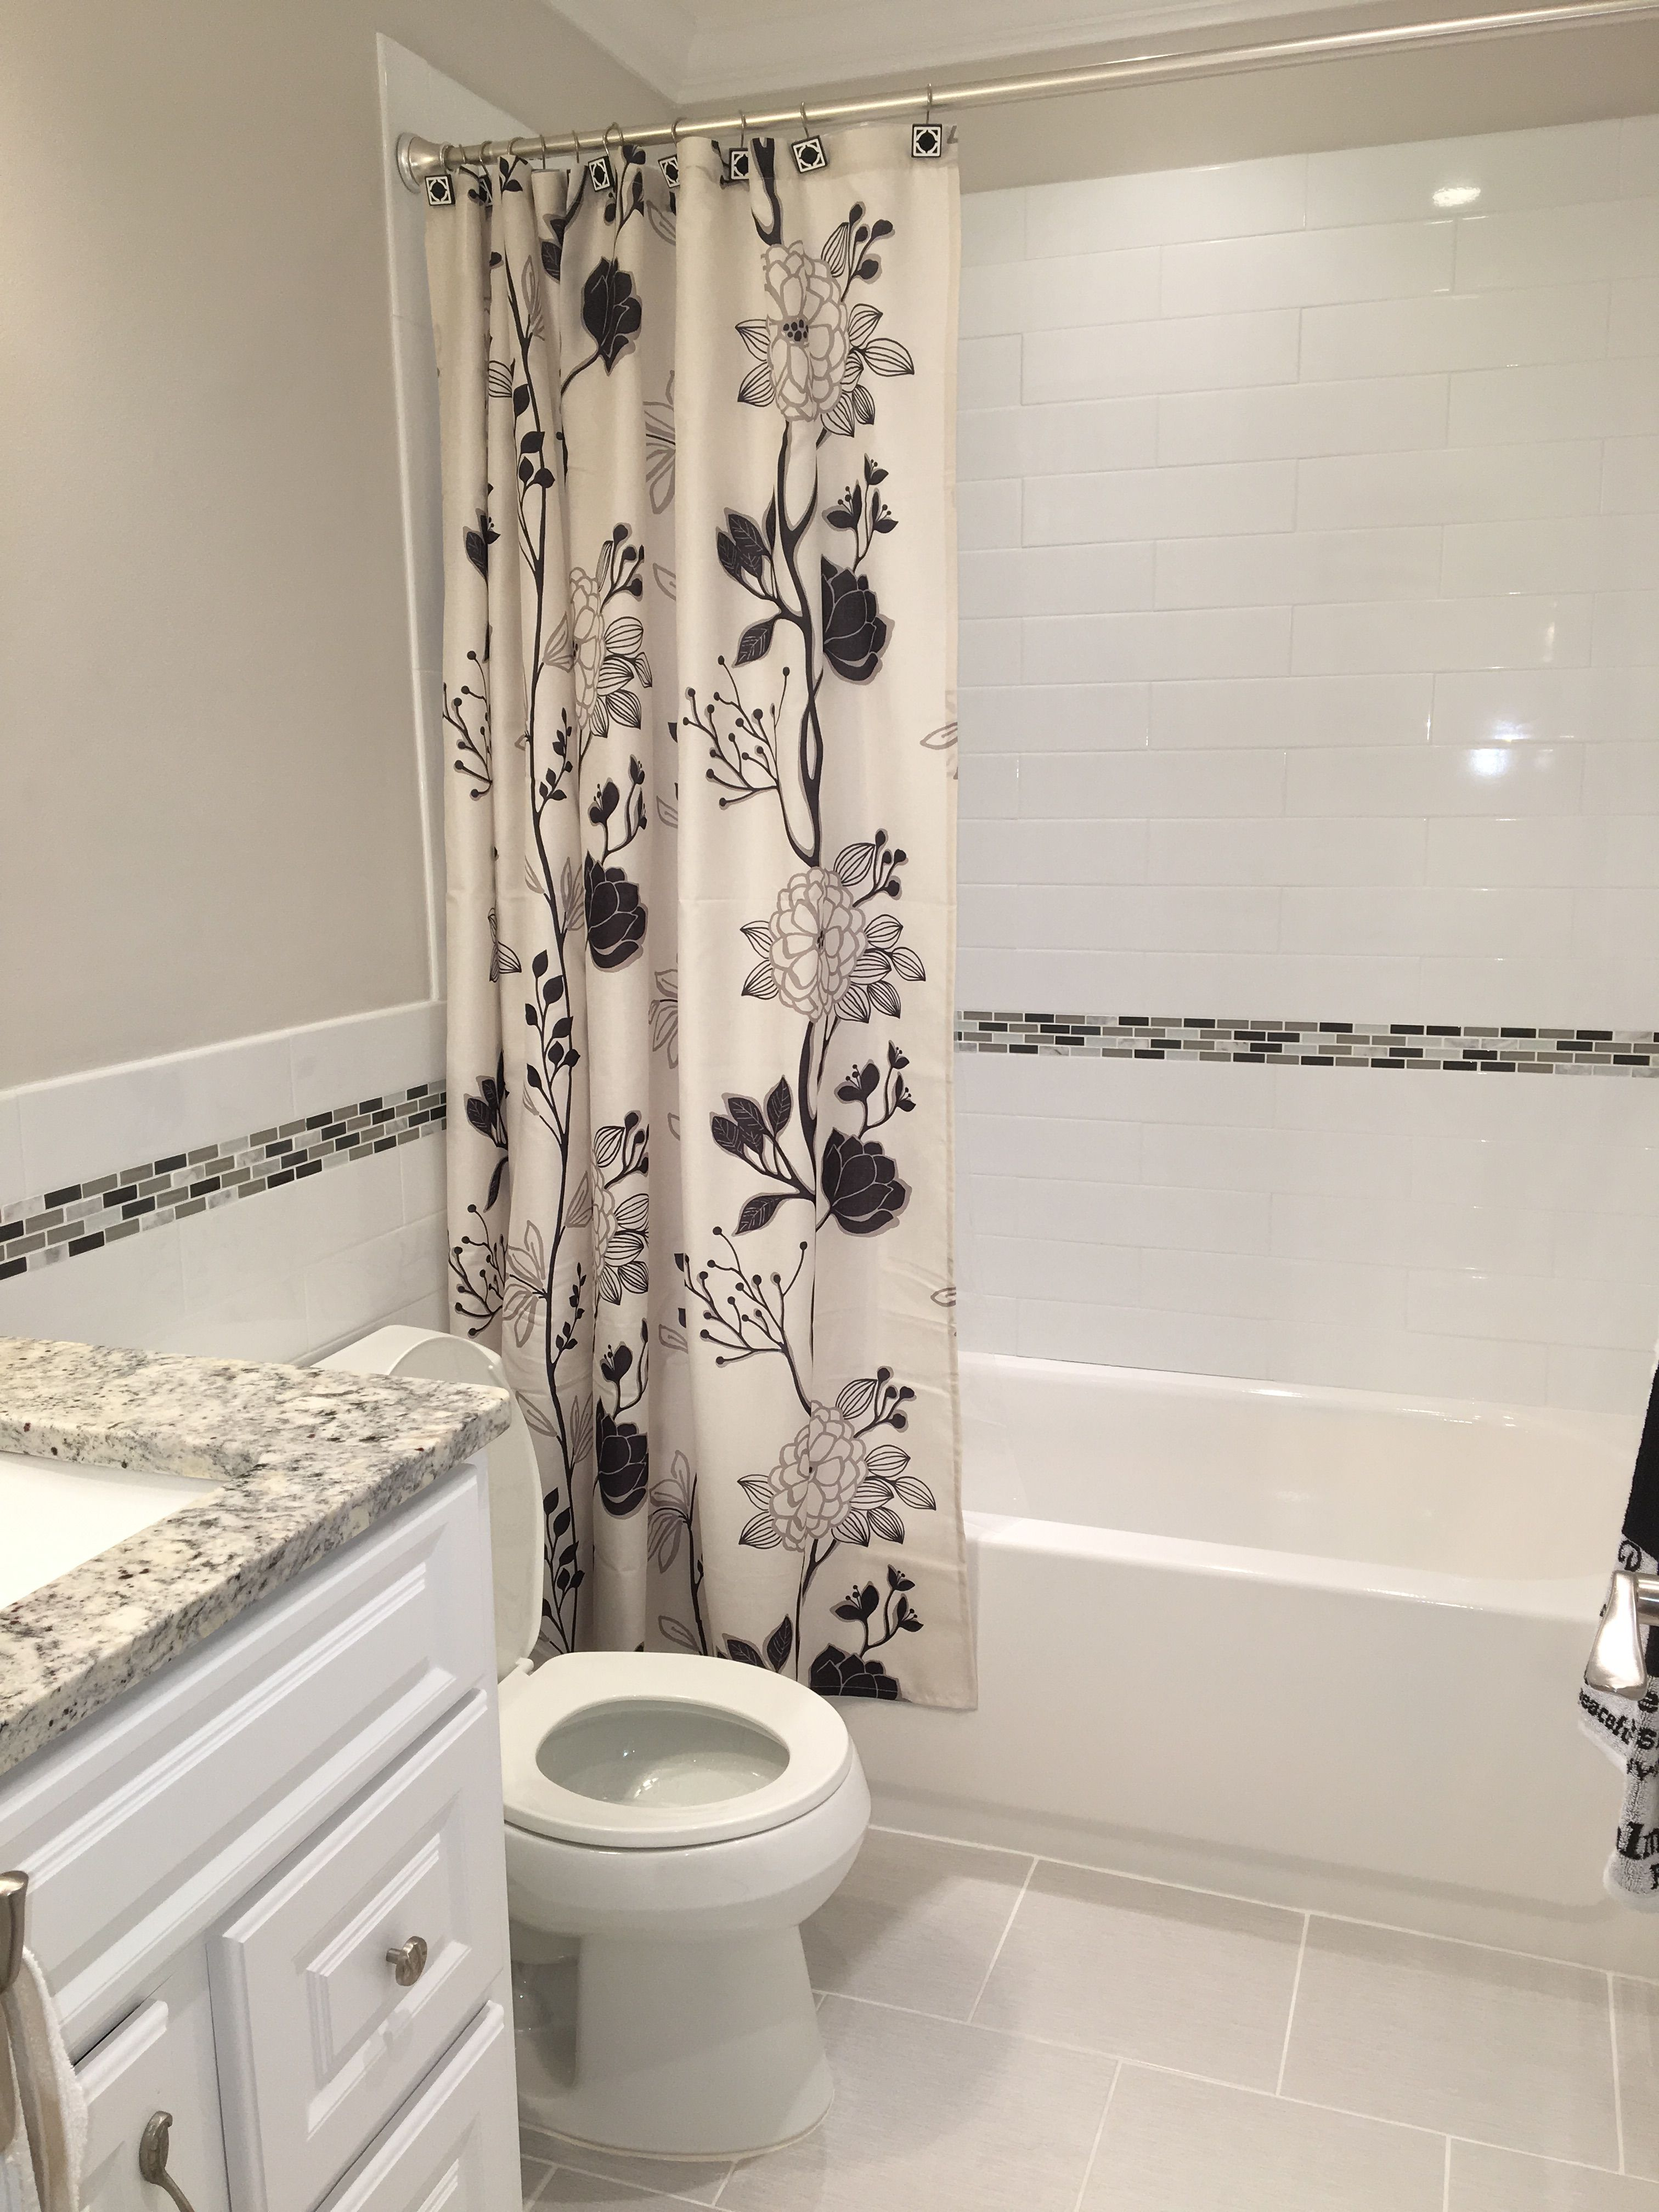 All Black White Gray Bathroom Benjamin Moore Balboa Mist On Walls